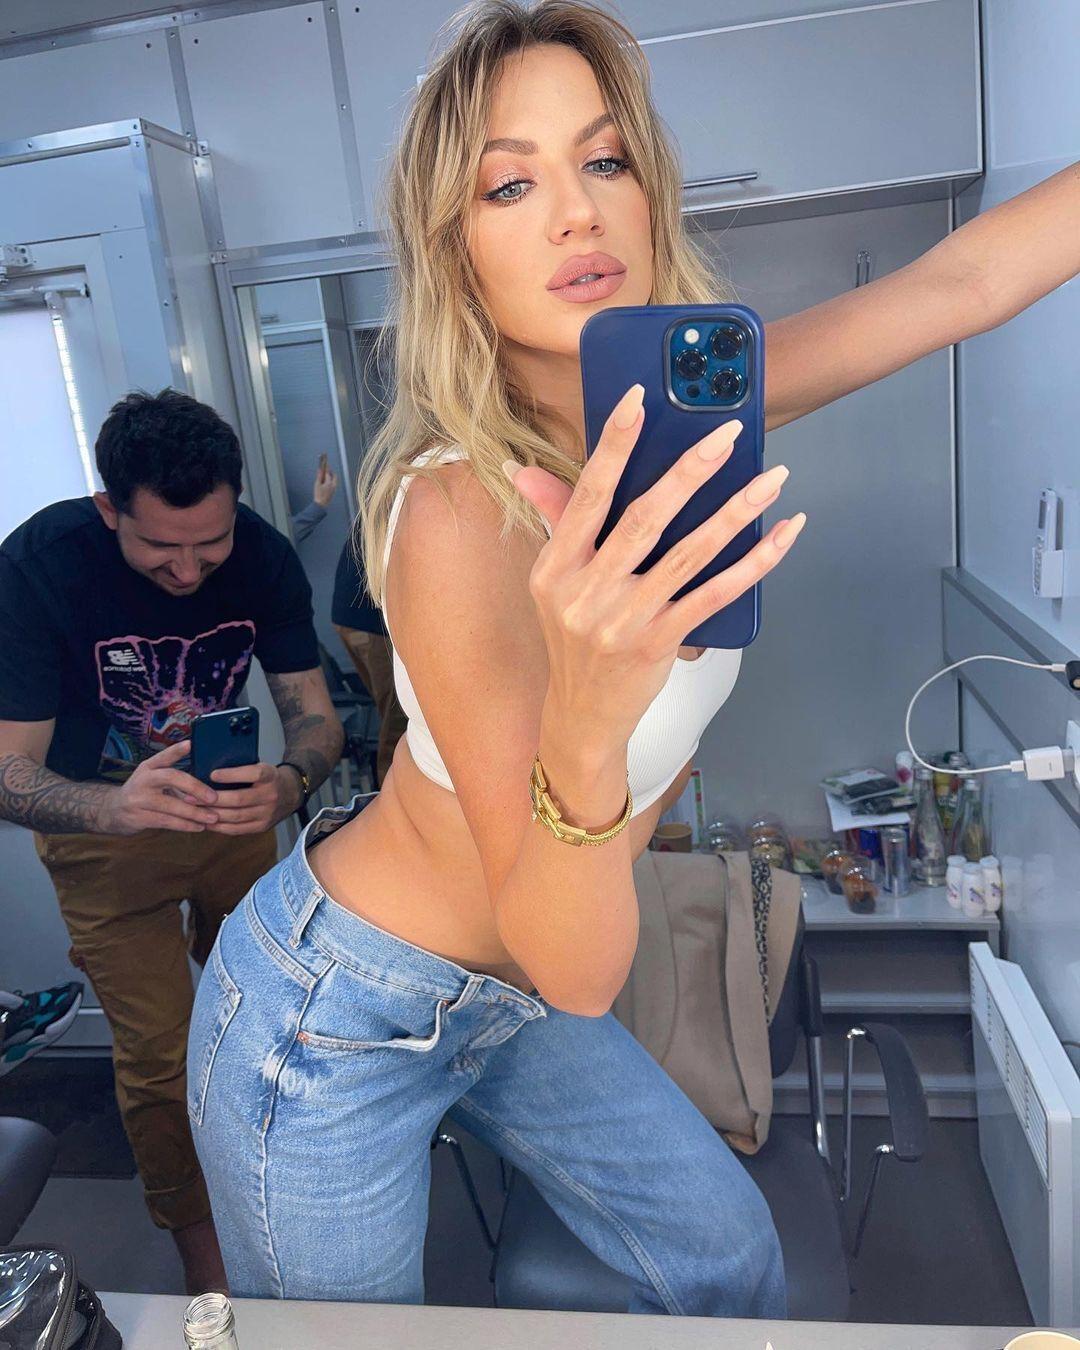 Леся Нікітюк показала сексуальне фото